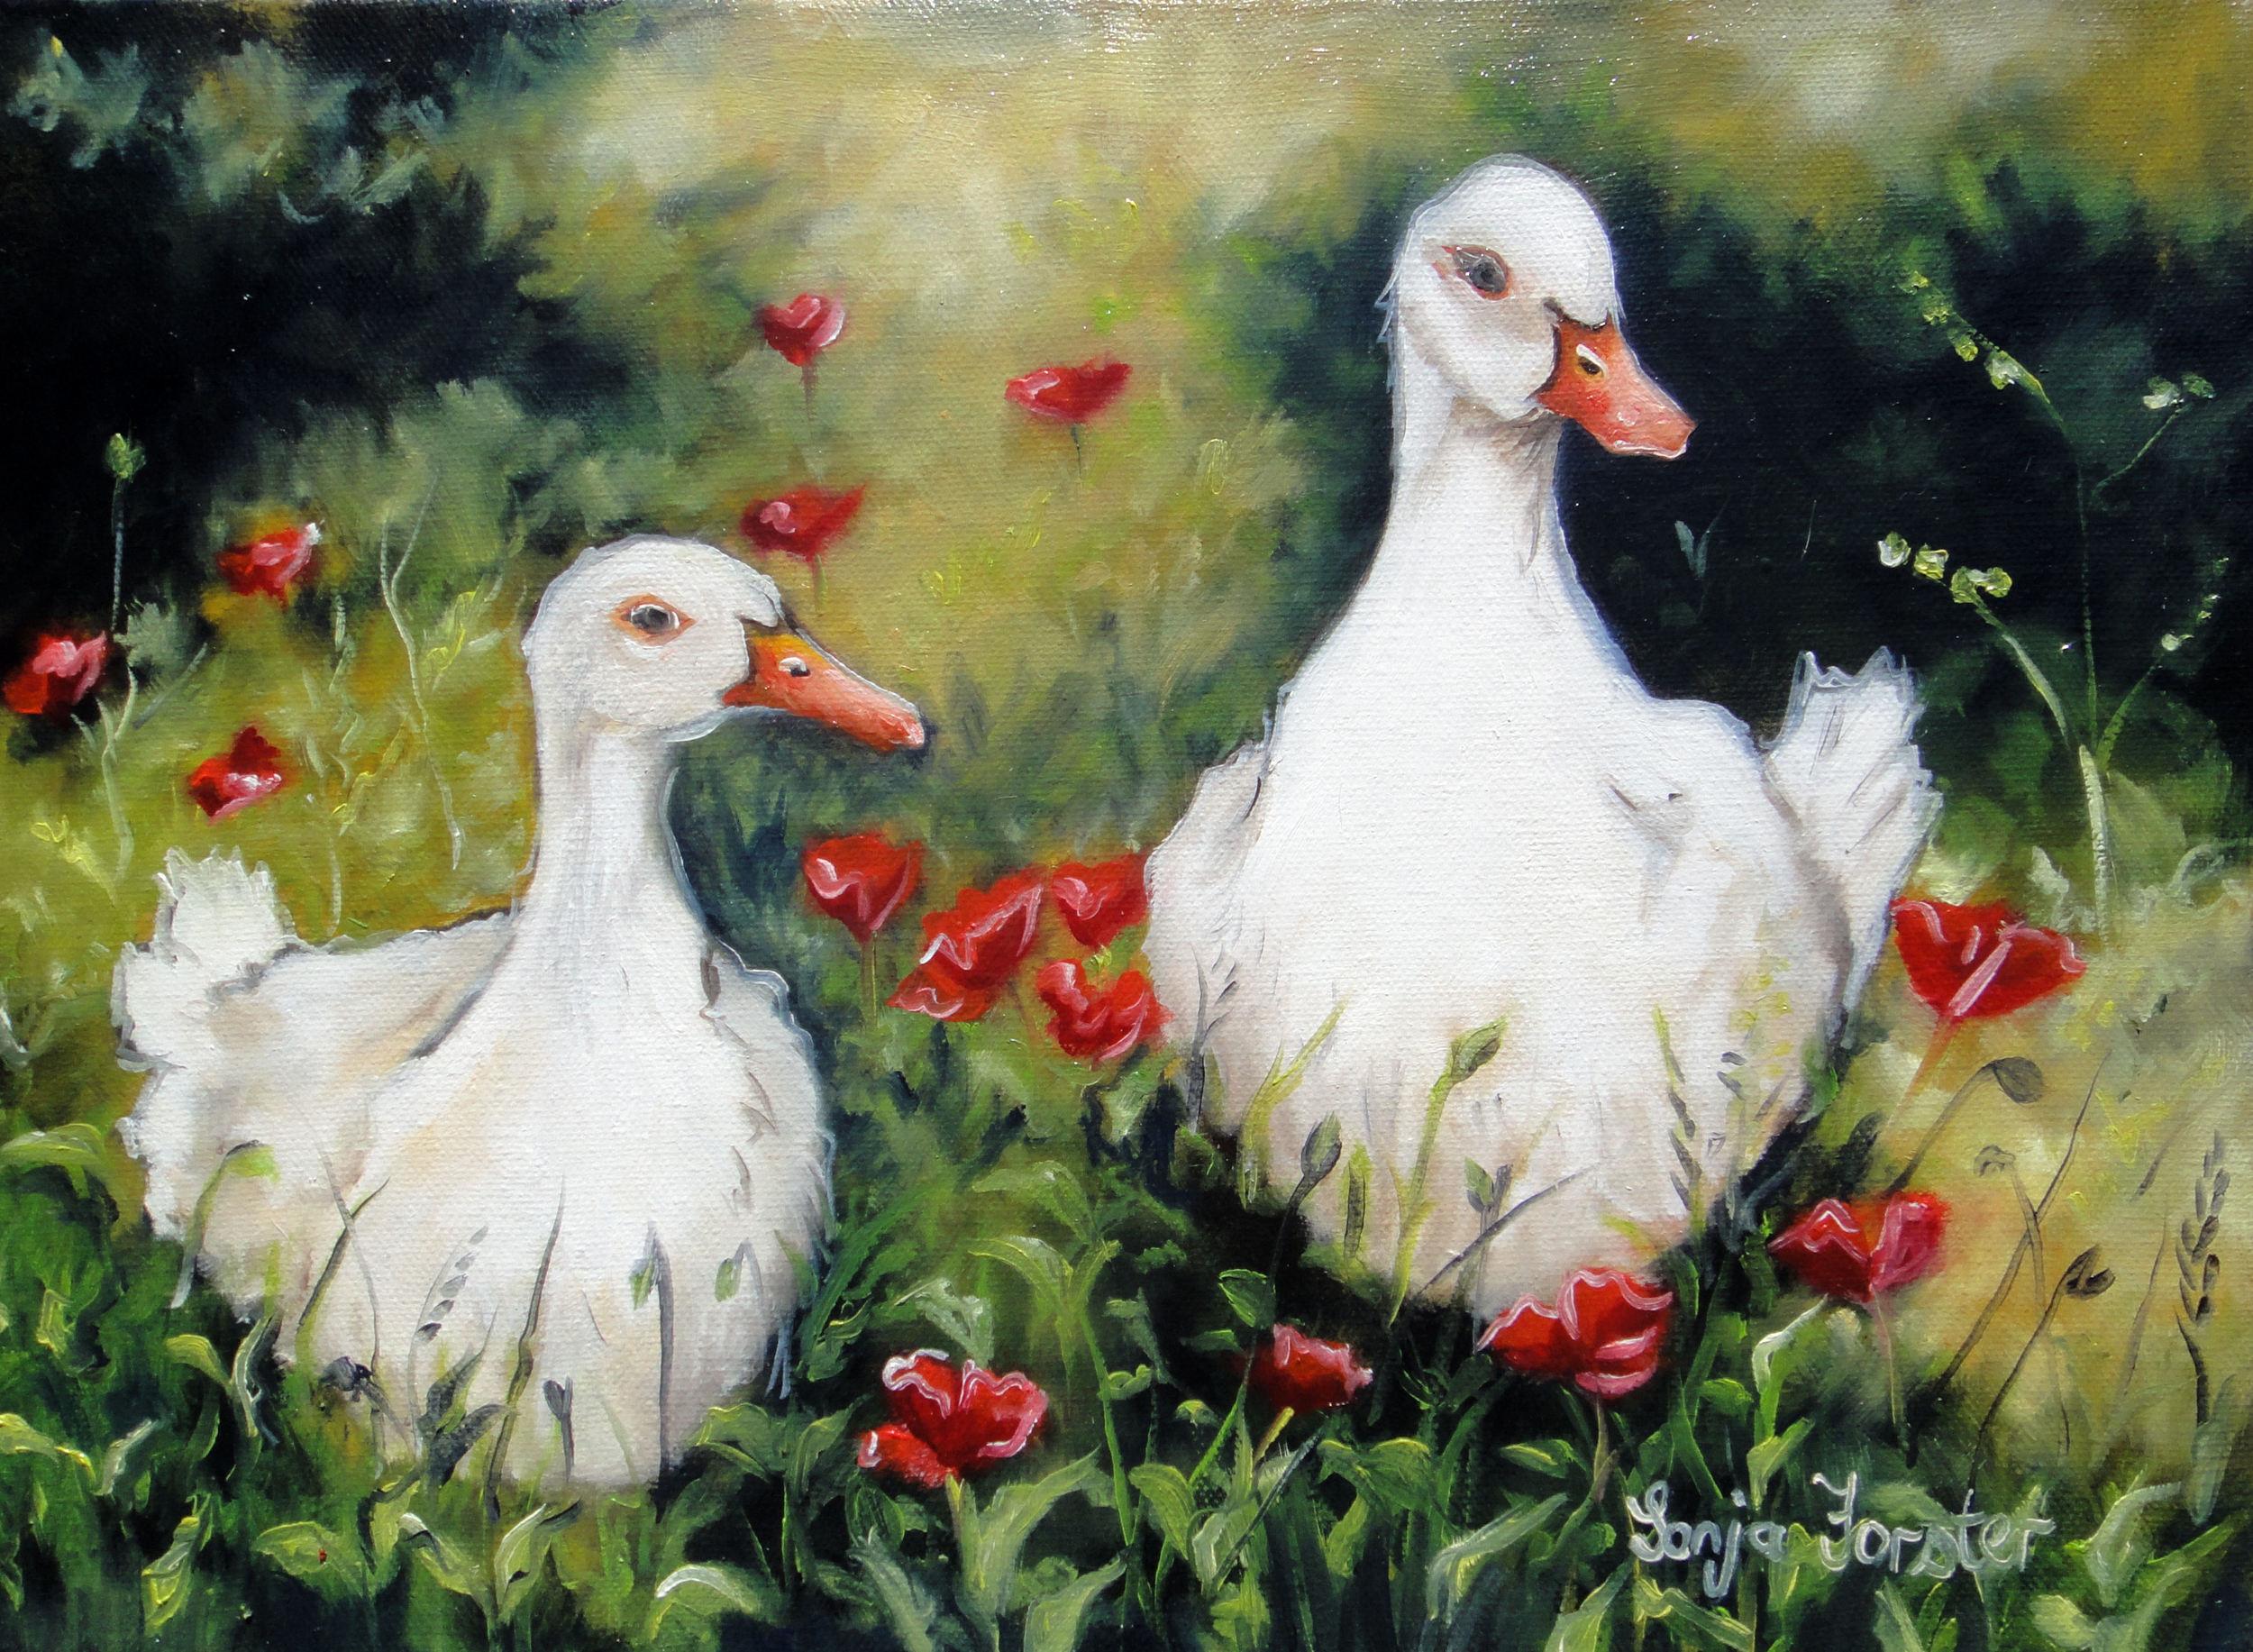 Sonja Forster Art - Wit Eende.jpg